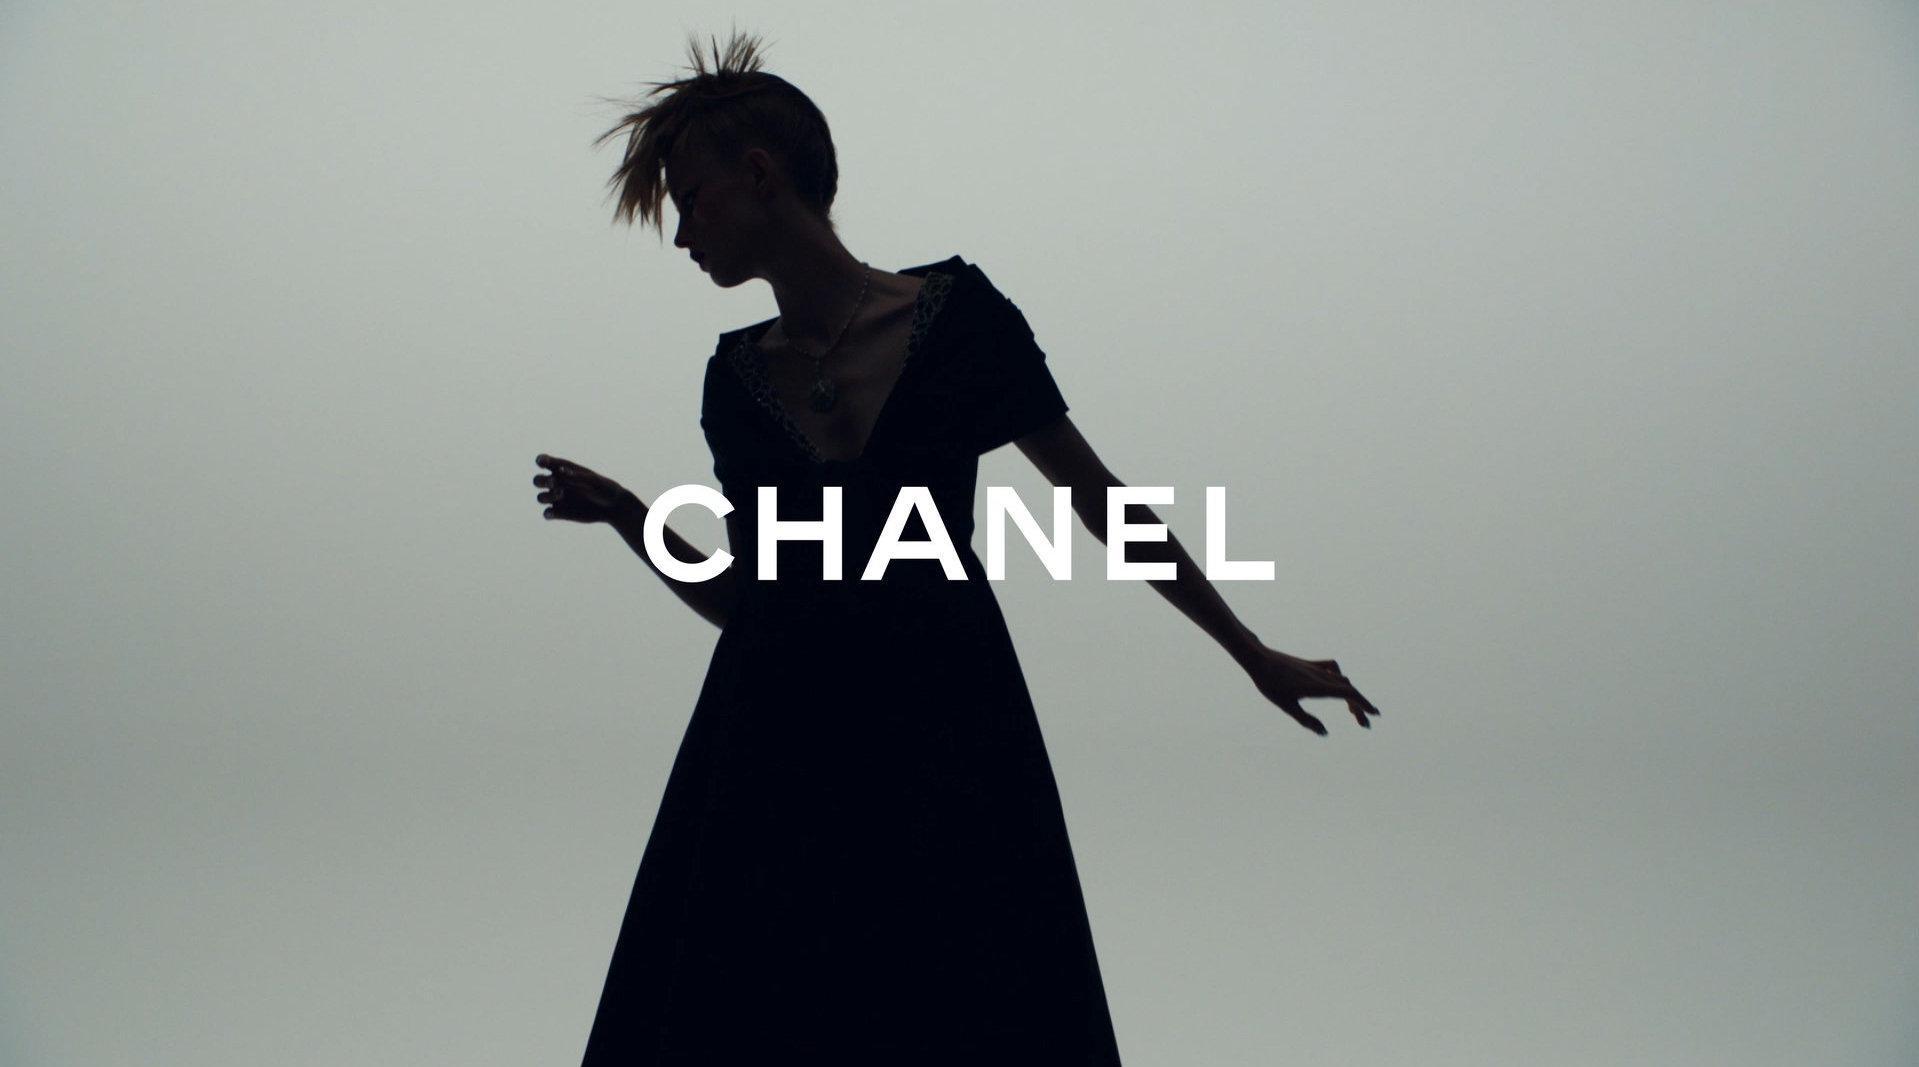 Chanel Fall 2020 高级定制系列 华丽的服饰配上朋克的妆容有一种